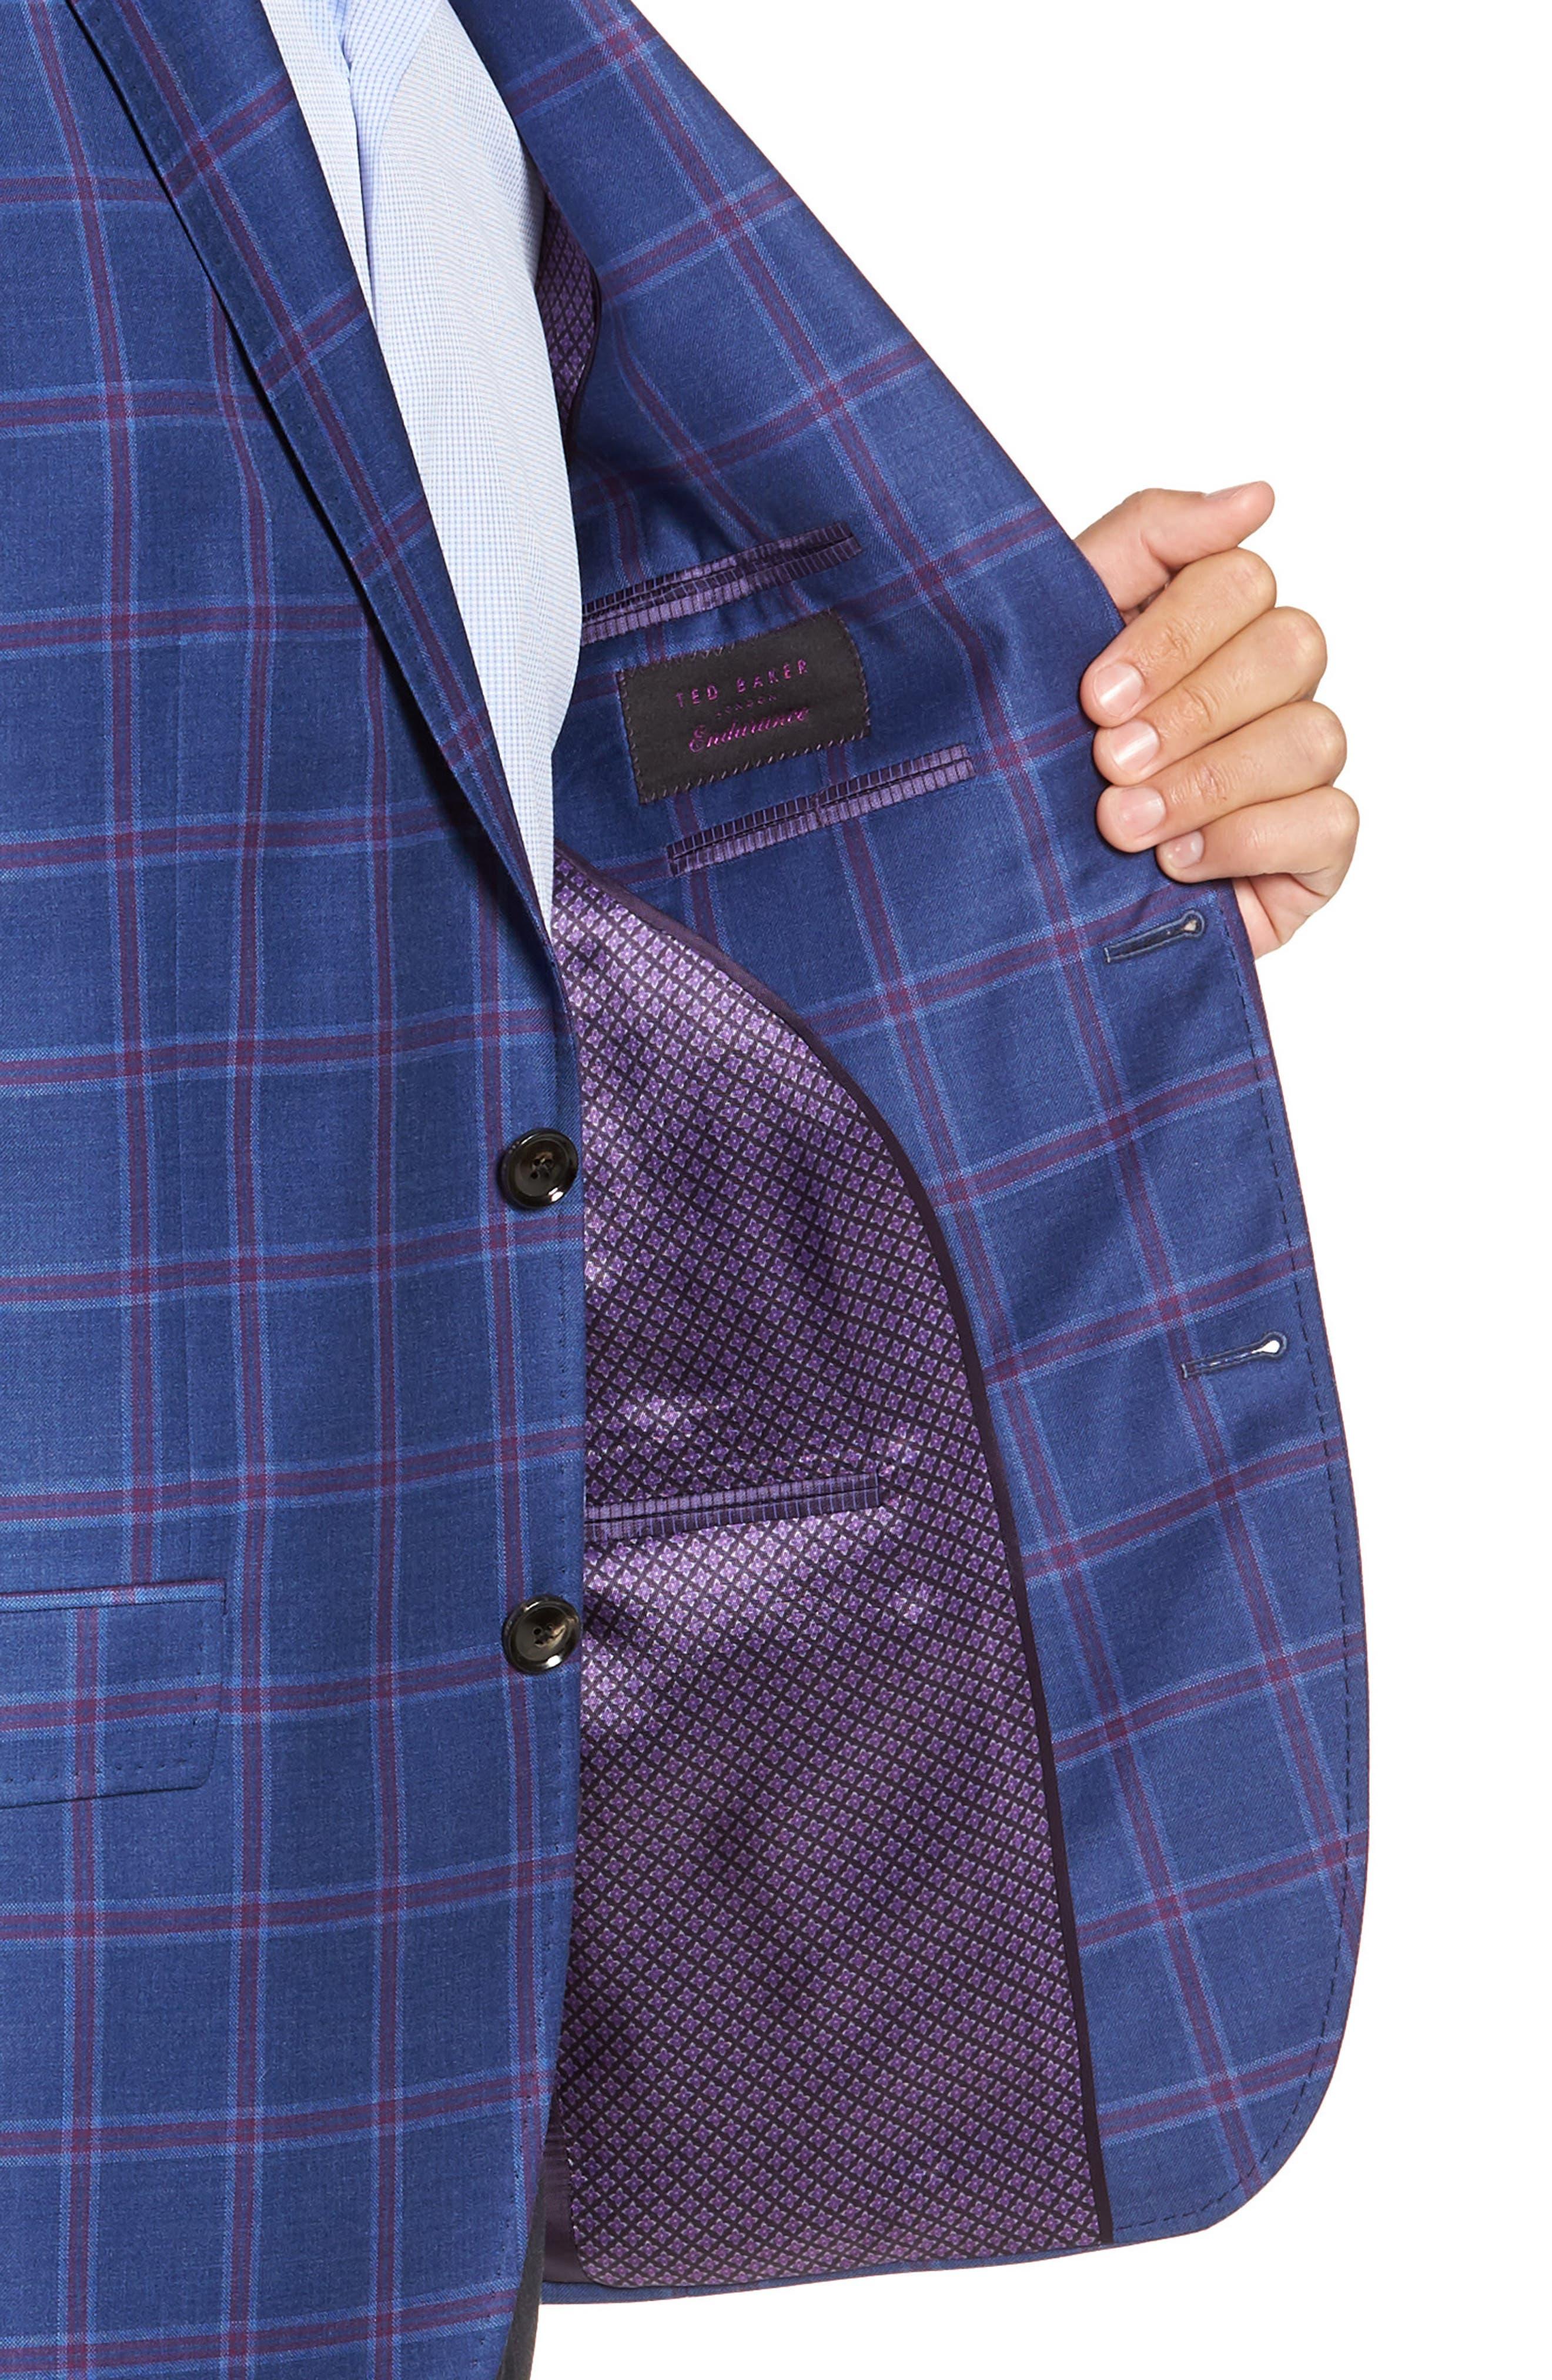 Konan Trim Fit Wool Sport Coat,                             Alternate thumbnail 4, color,                             BLUE